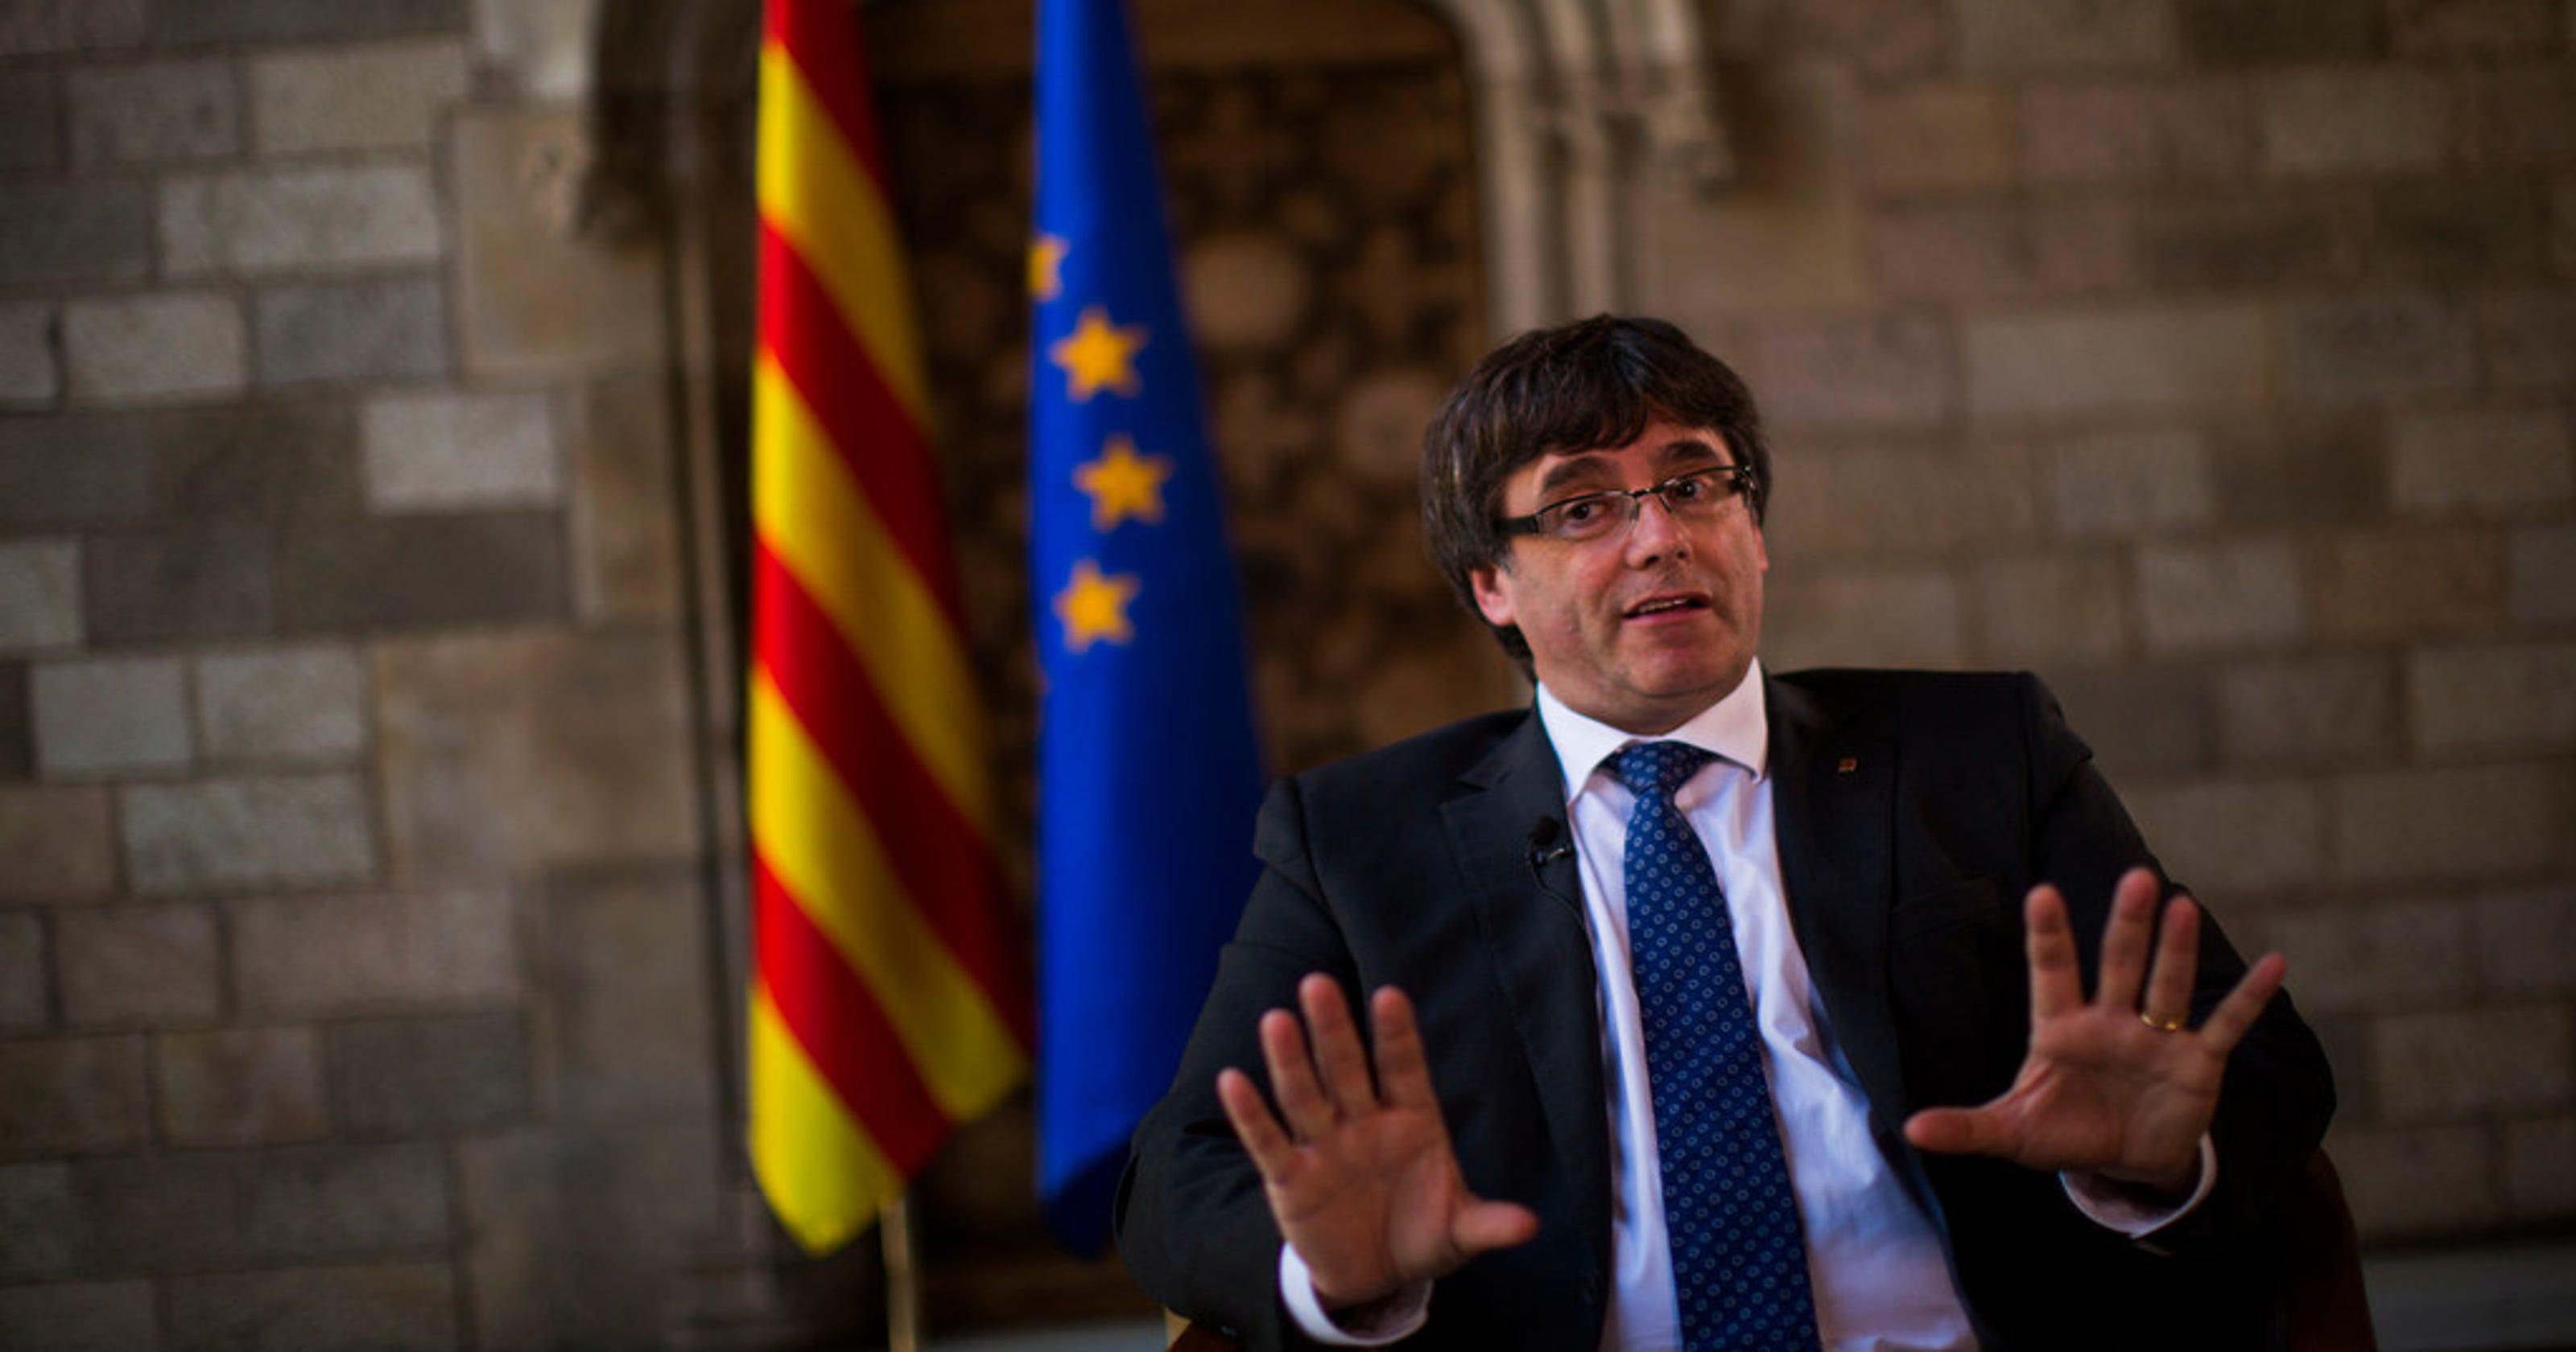 c5a6e017828 Catalonia independence vote  Spain says it will block secession vote